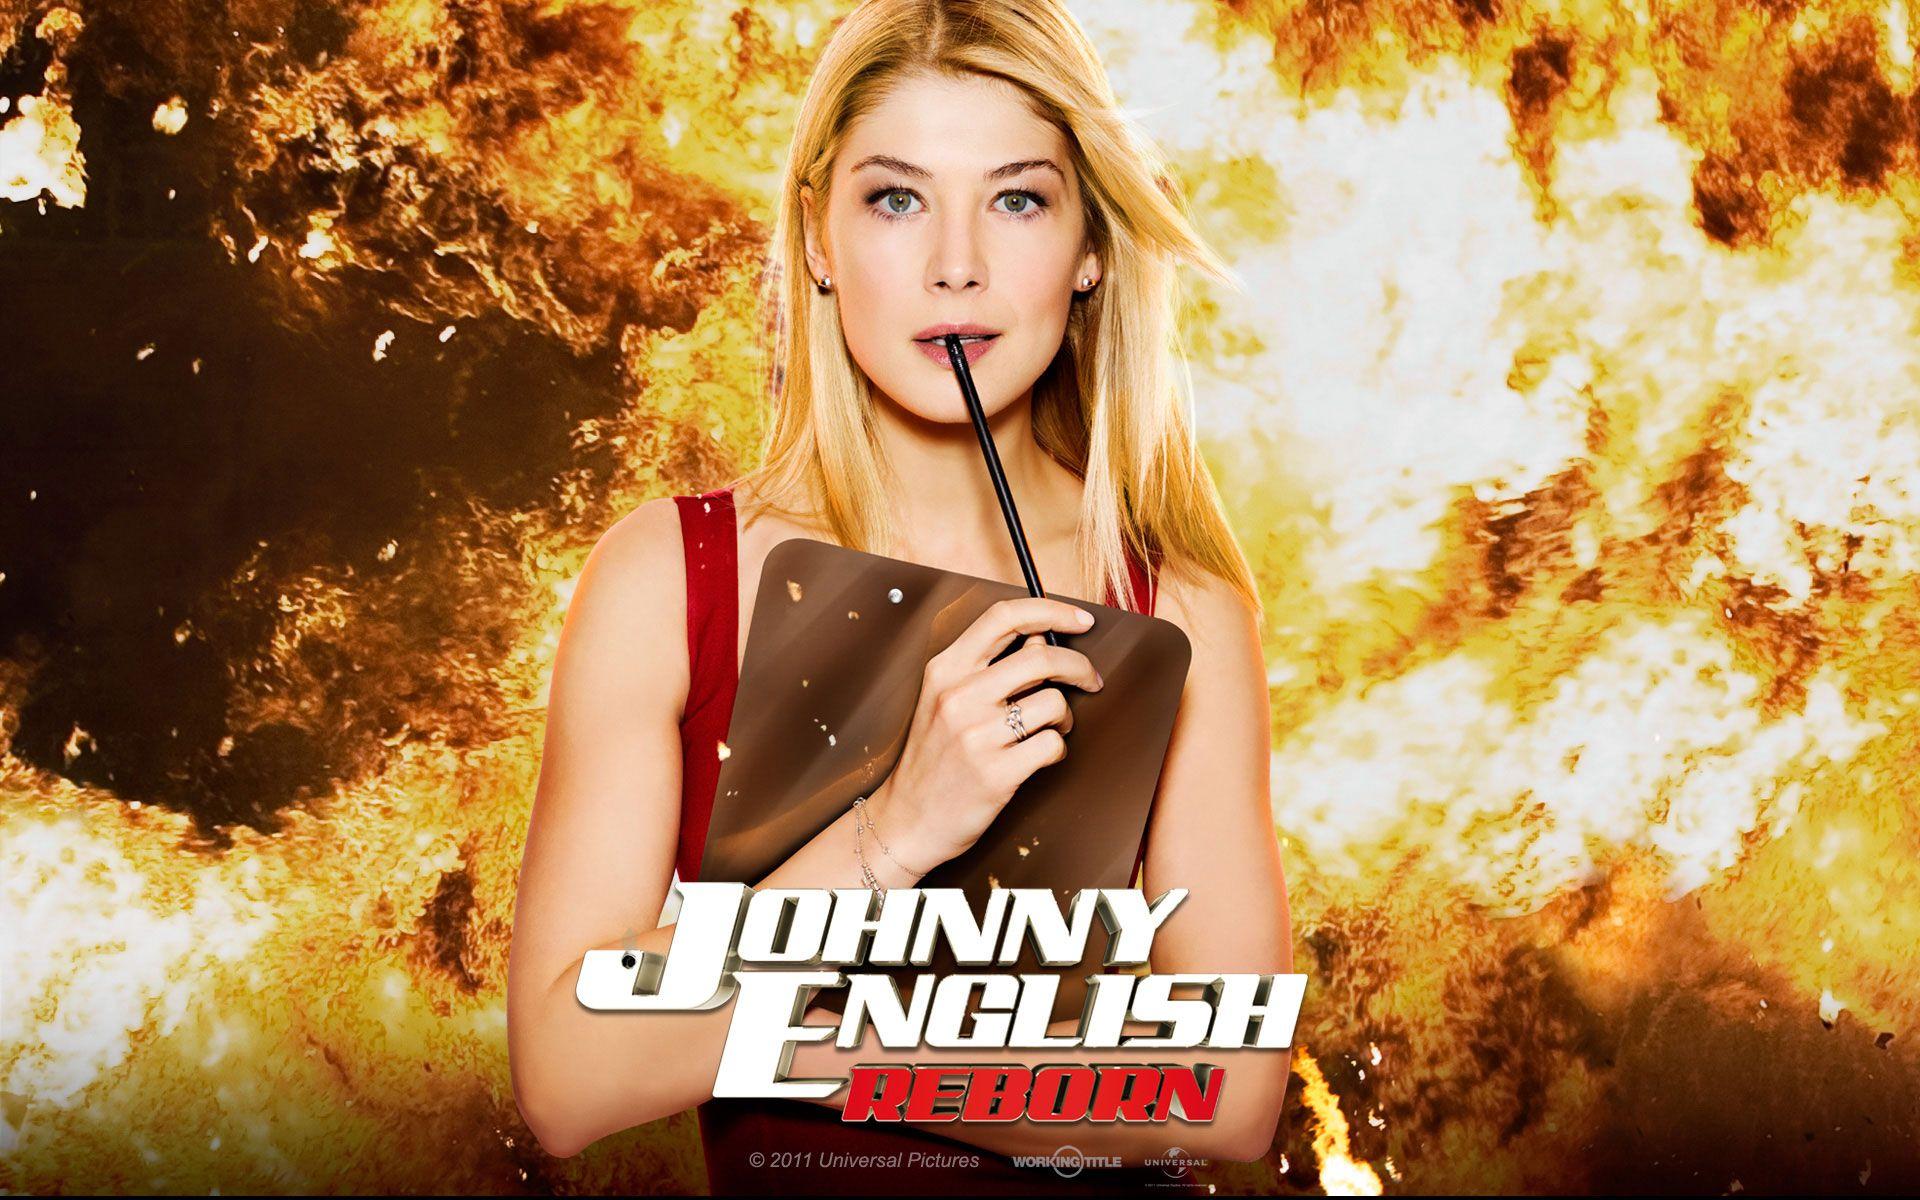 Watch Streaming Hd Johnny English Reborn Starring Rowan Atkinson Rosamund Pike Dominic West Roger Barclay Johnny English Goes Up Against International Assa